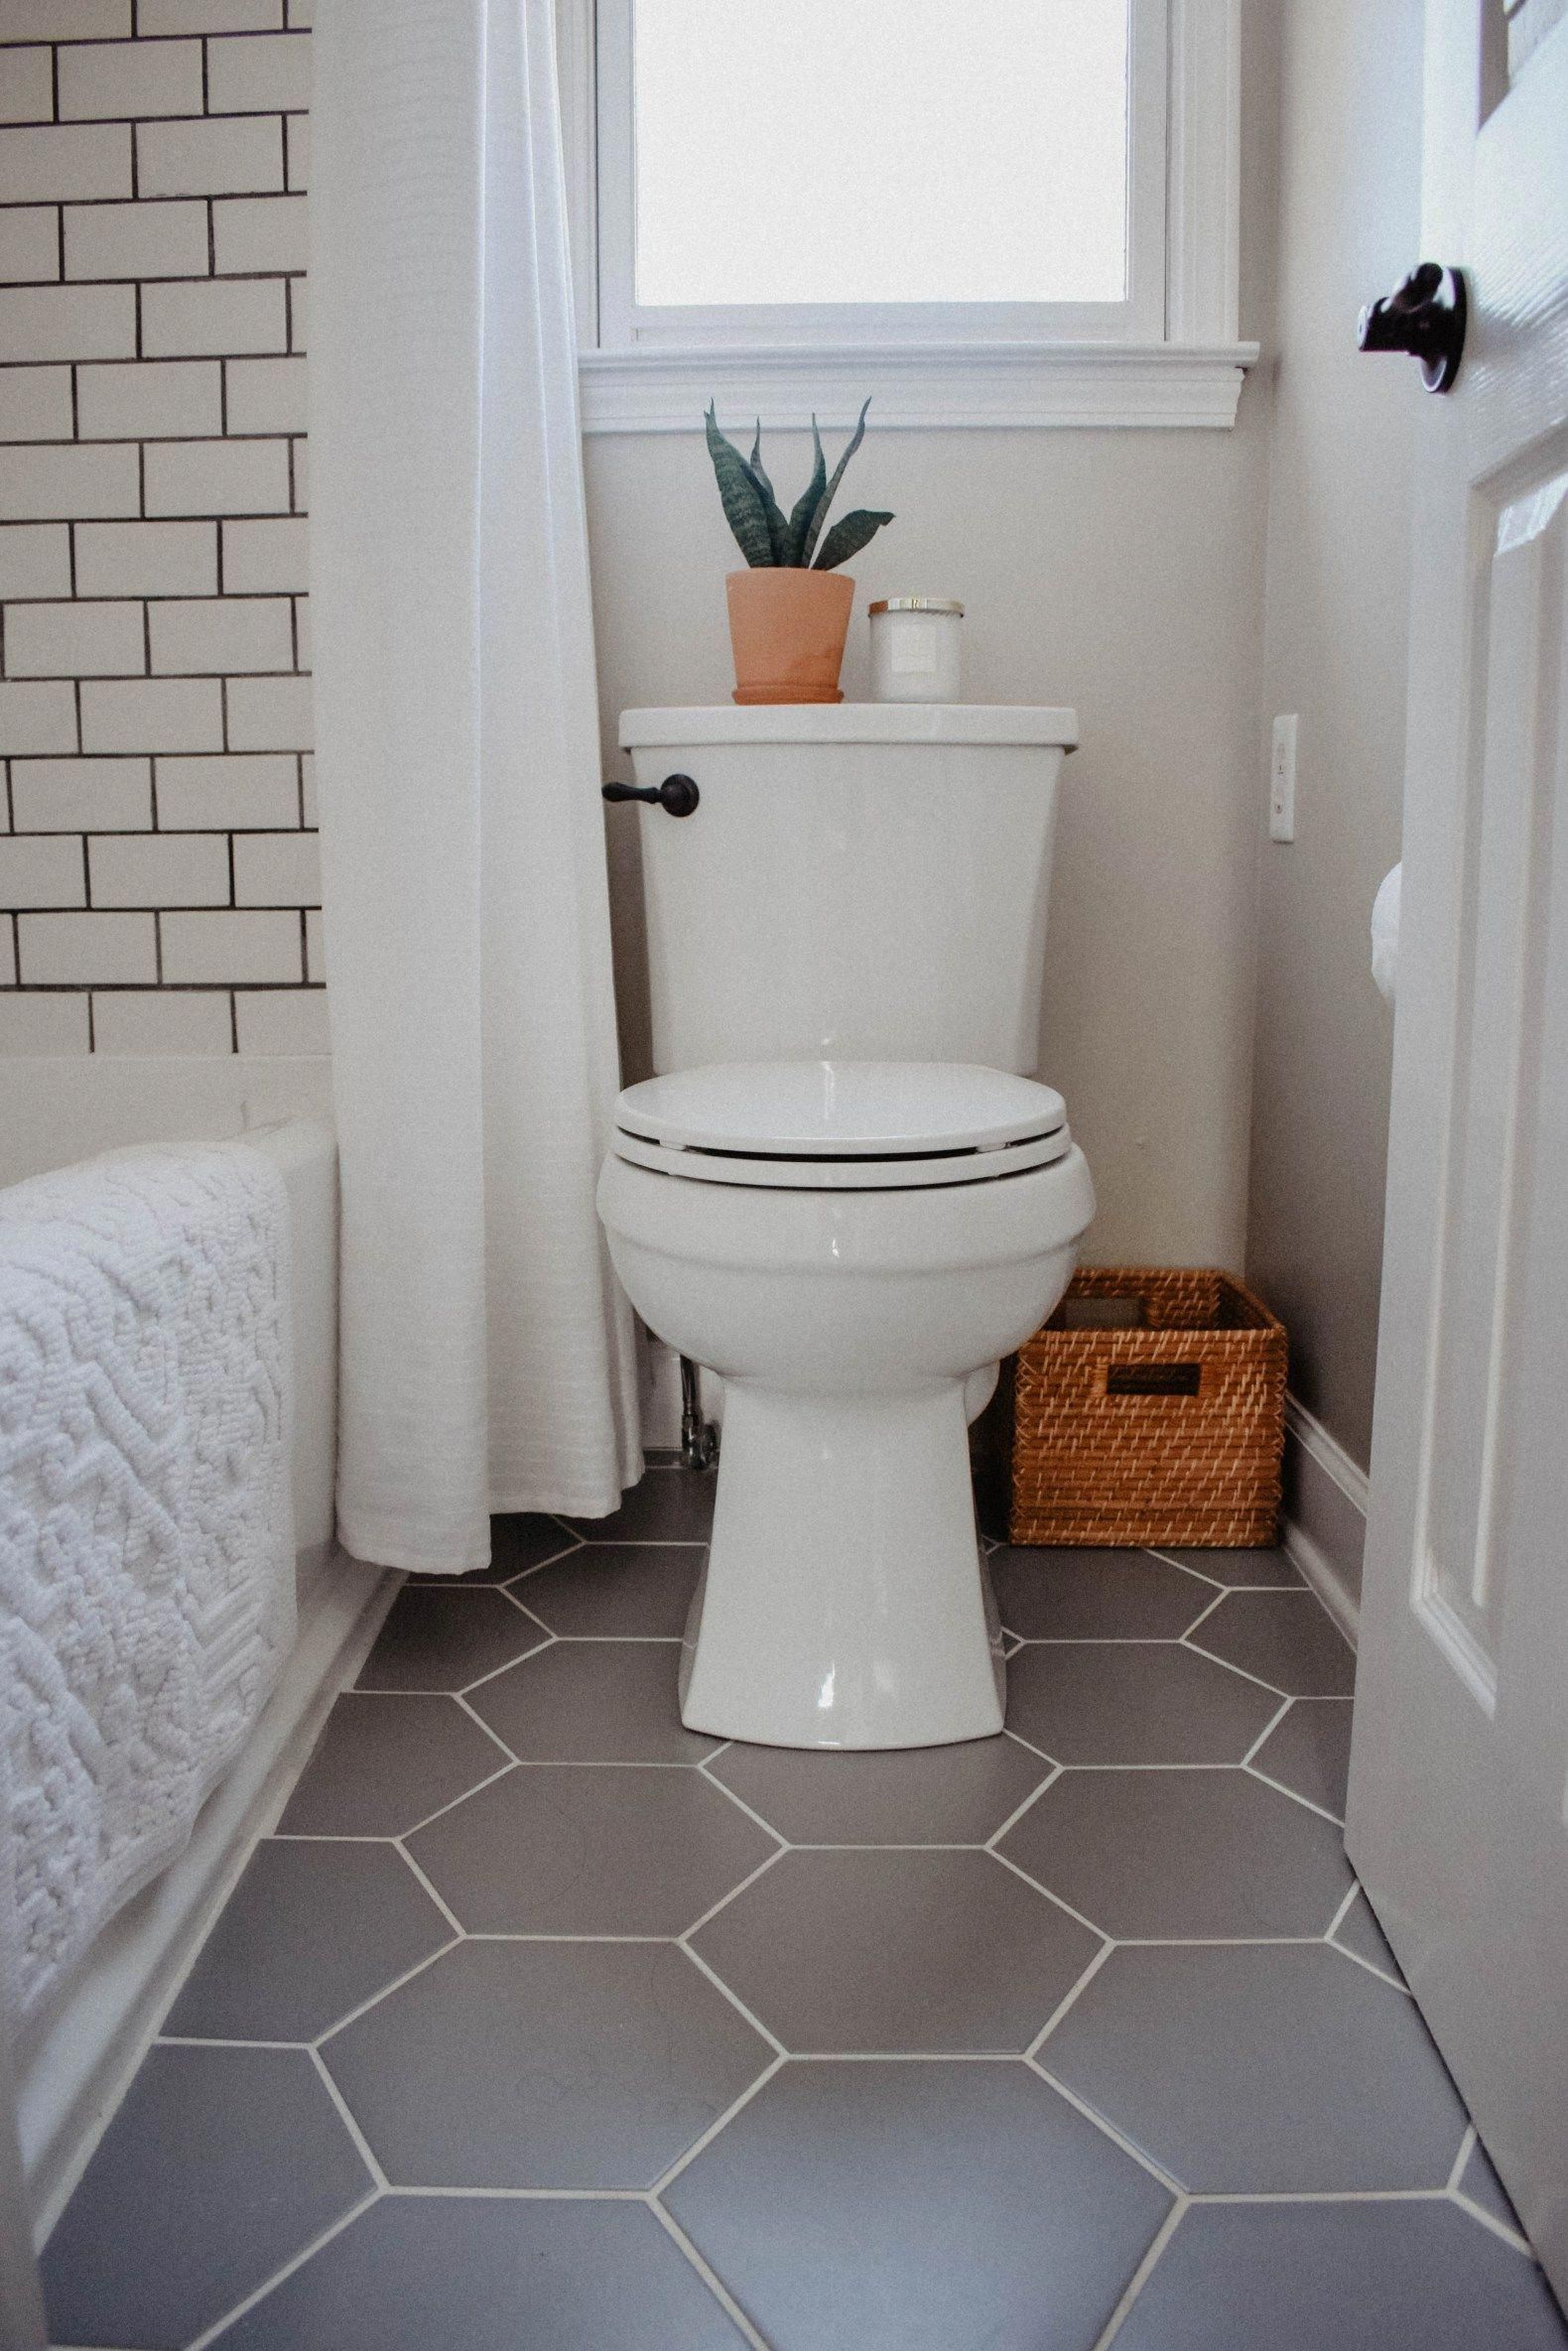 Bathroom Design With Noken Sanitaryware Shower Heads Bathroom